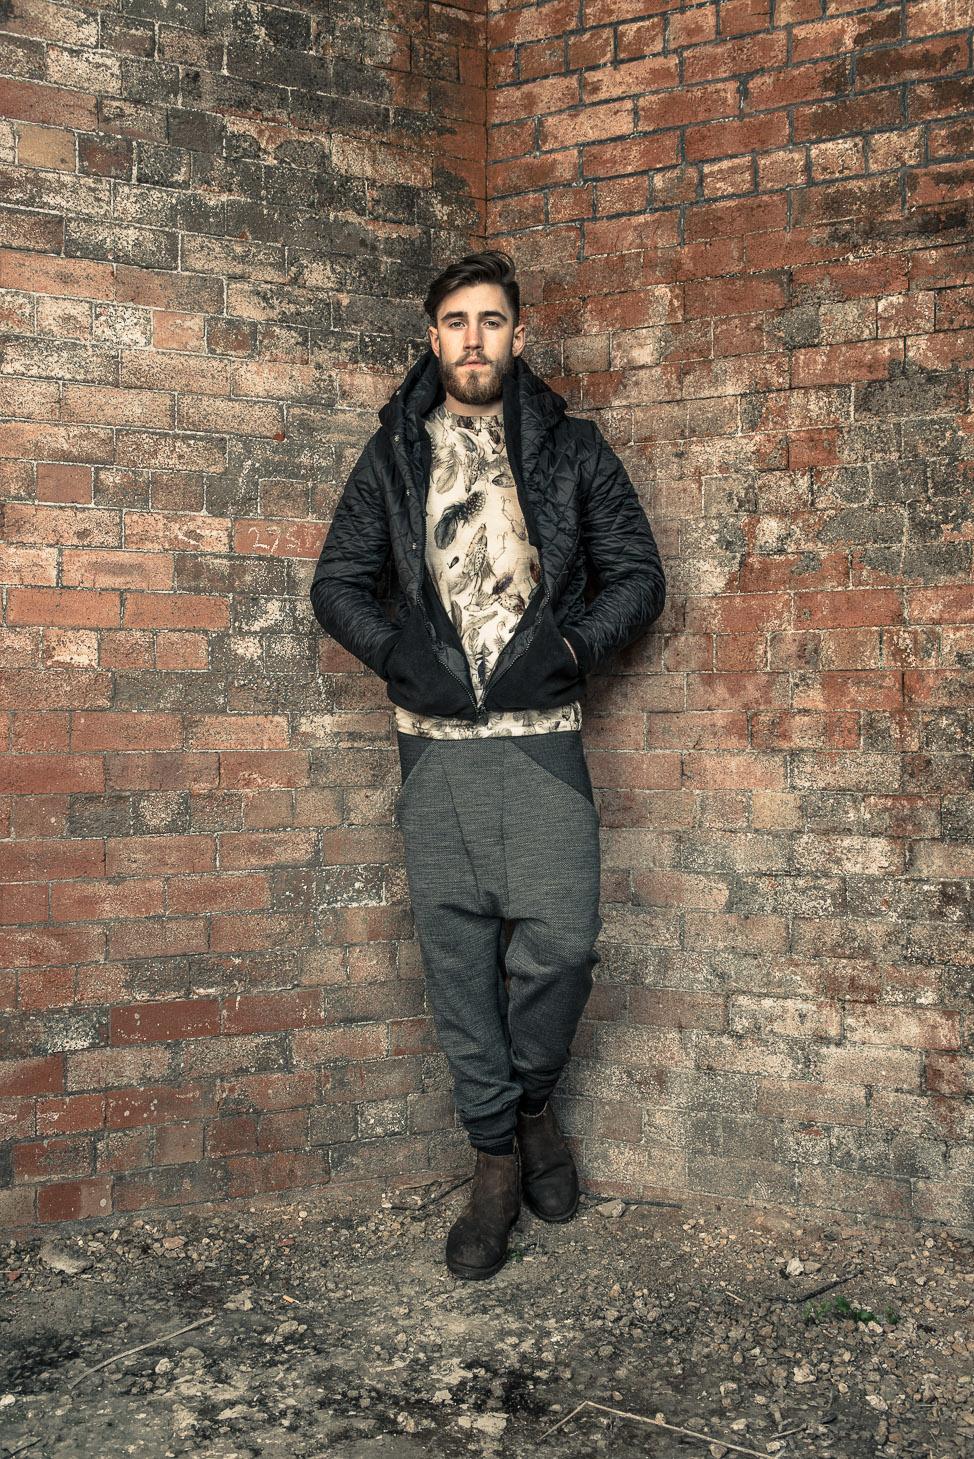 zaramia-ava-zaramiaava-leeds-fashion-designer-ethical-sustainable-tailored-minimalist-fitted-versatile-drape-koji-quileted-coat-grey-tshirt-top-hareem-trousers-black-grey-texture-styling-32.jpg